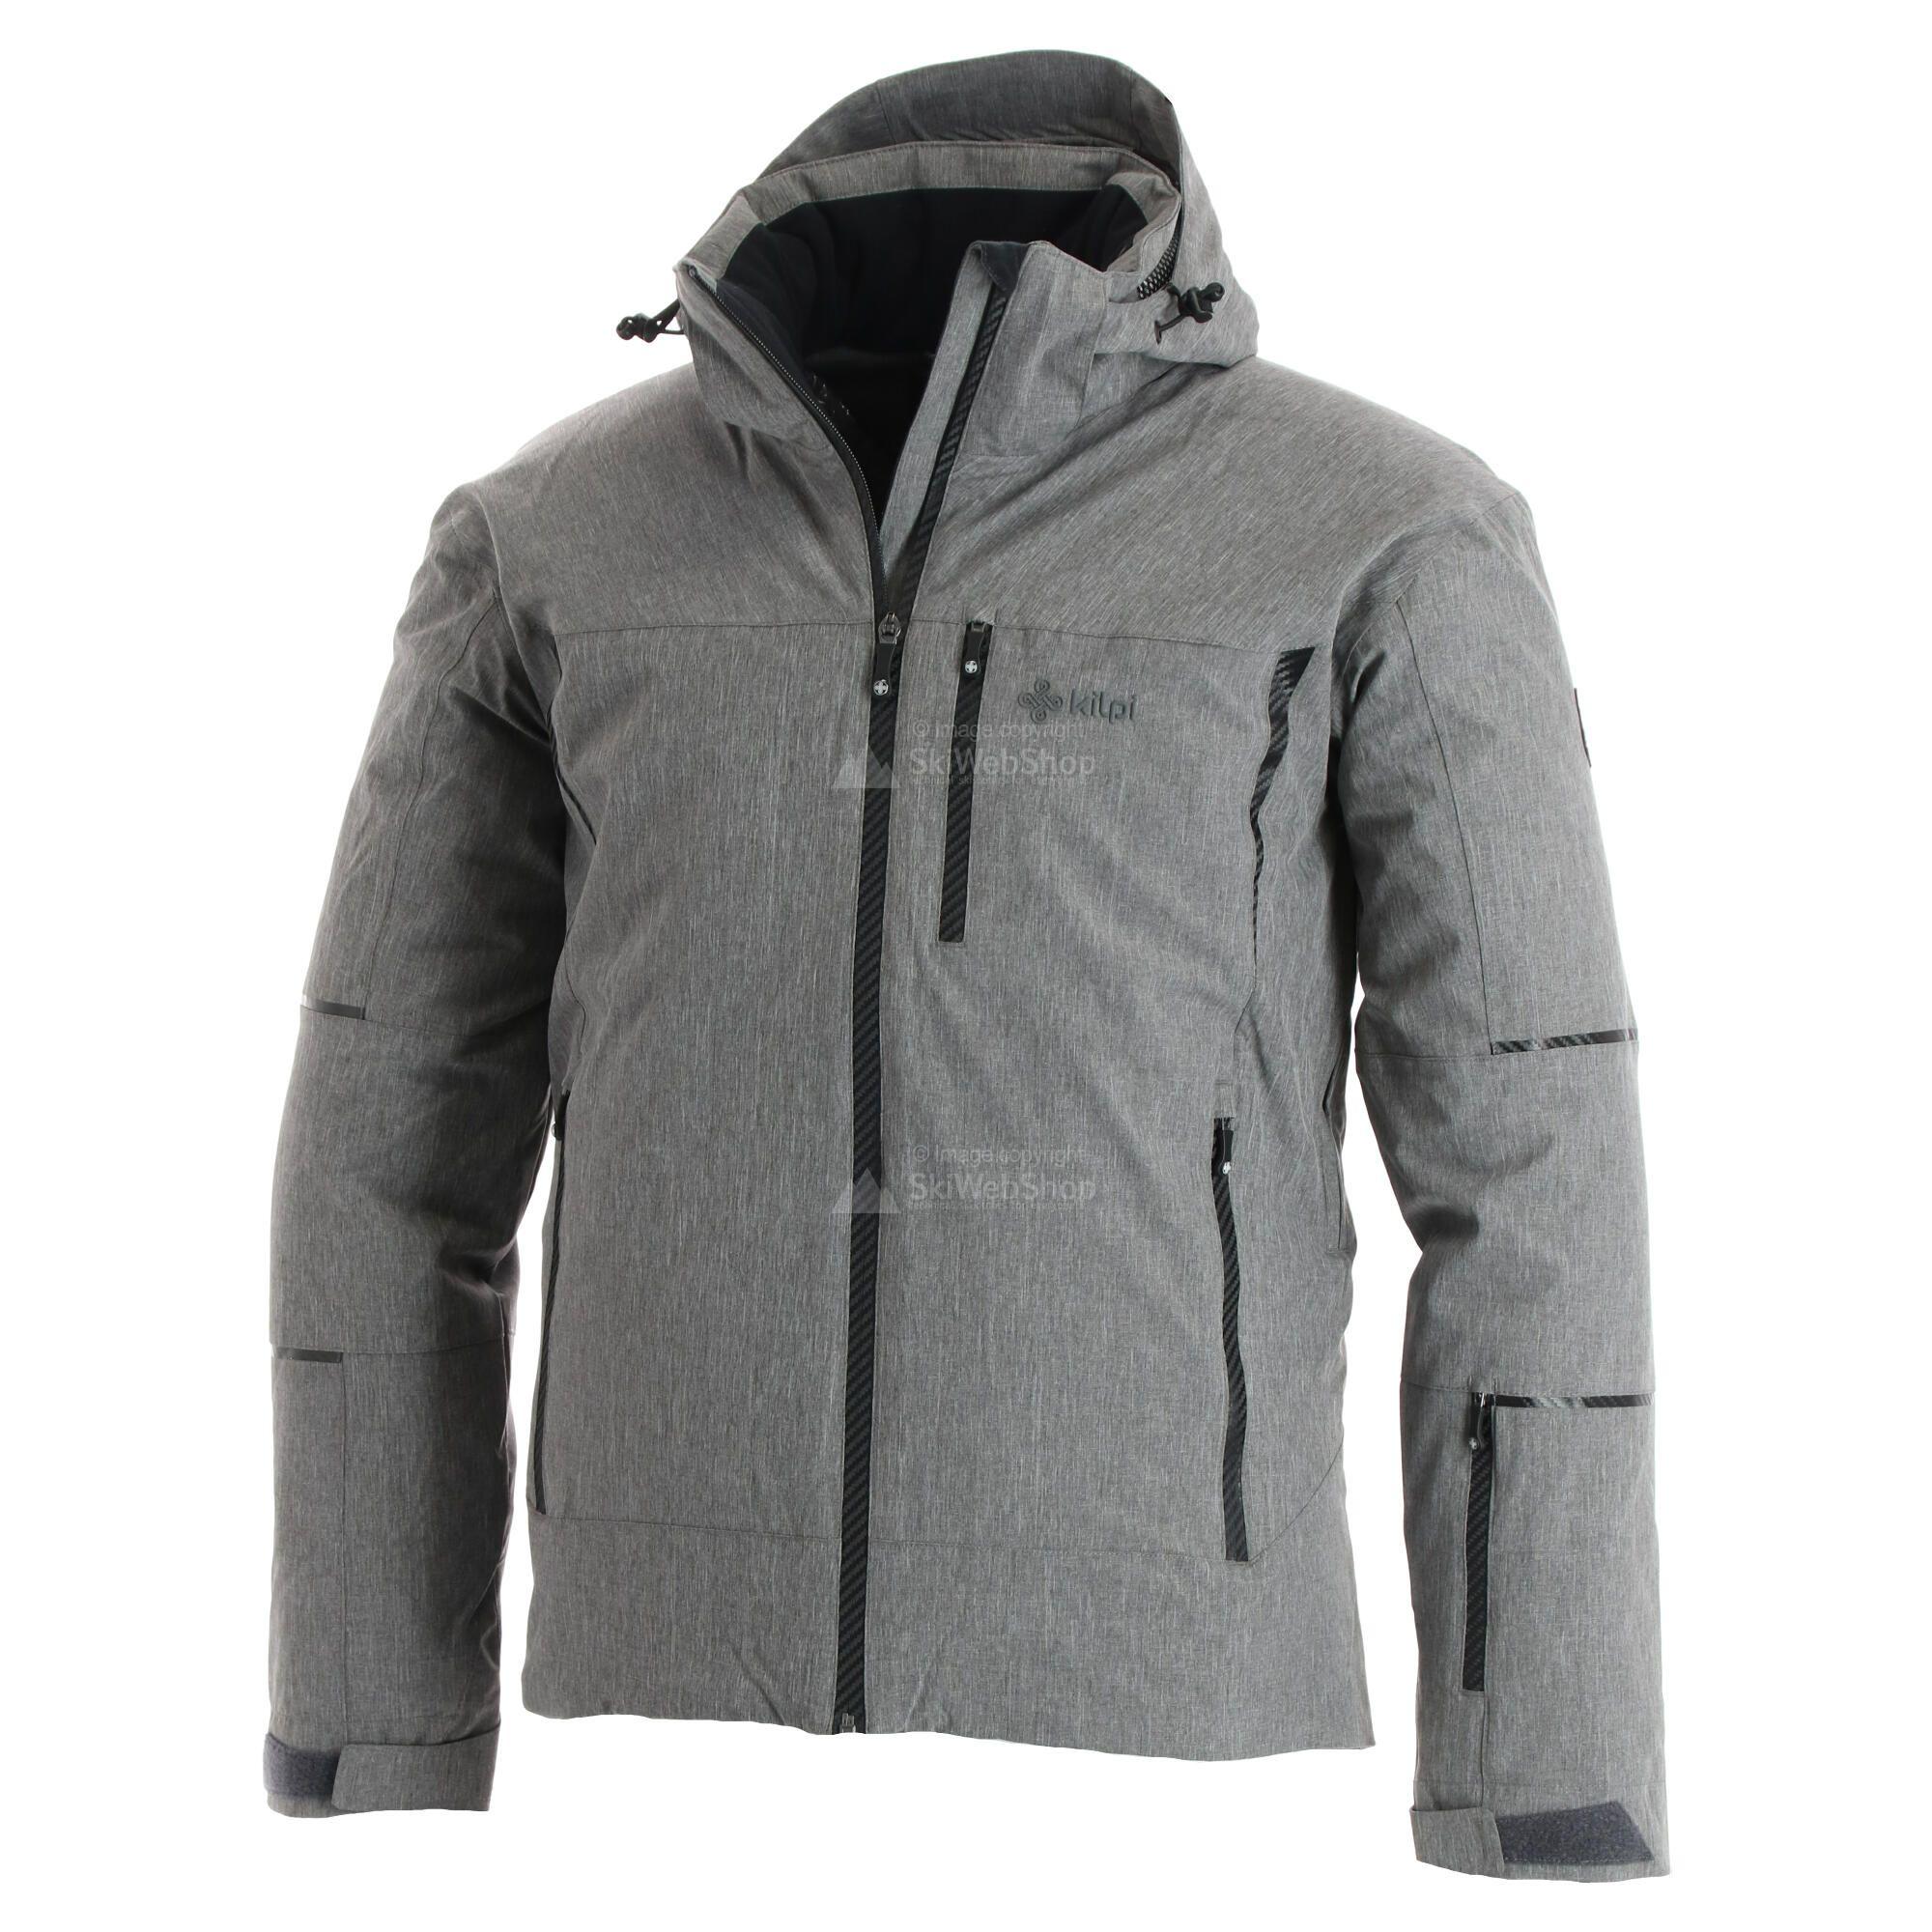 Kilpi, Tonn, ski jas, heren, grote maat, dark grijs • SkiWebShop